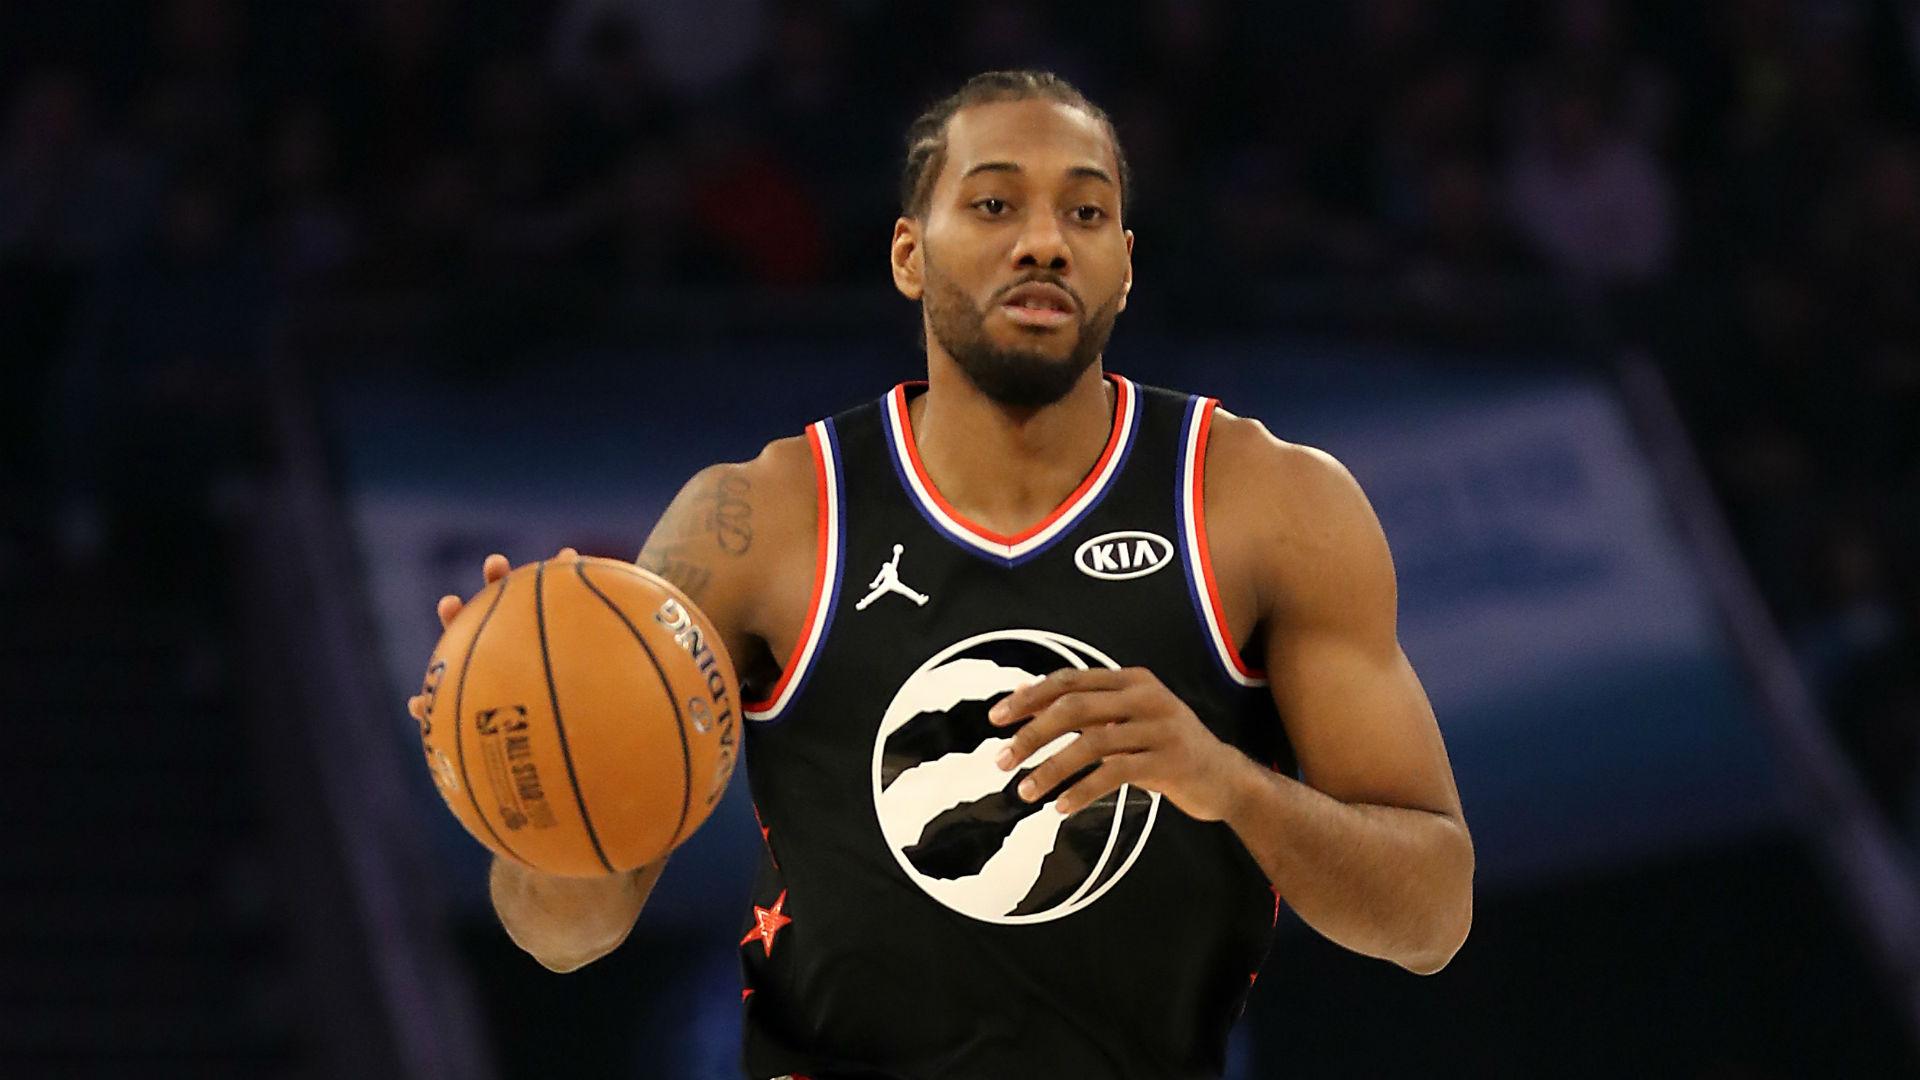 Kawhi Leonard shines for Team LeBron in NBA All-Star game victory